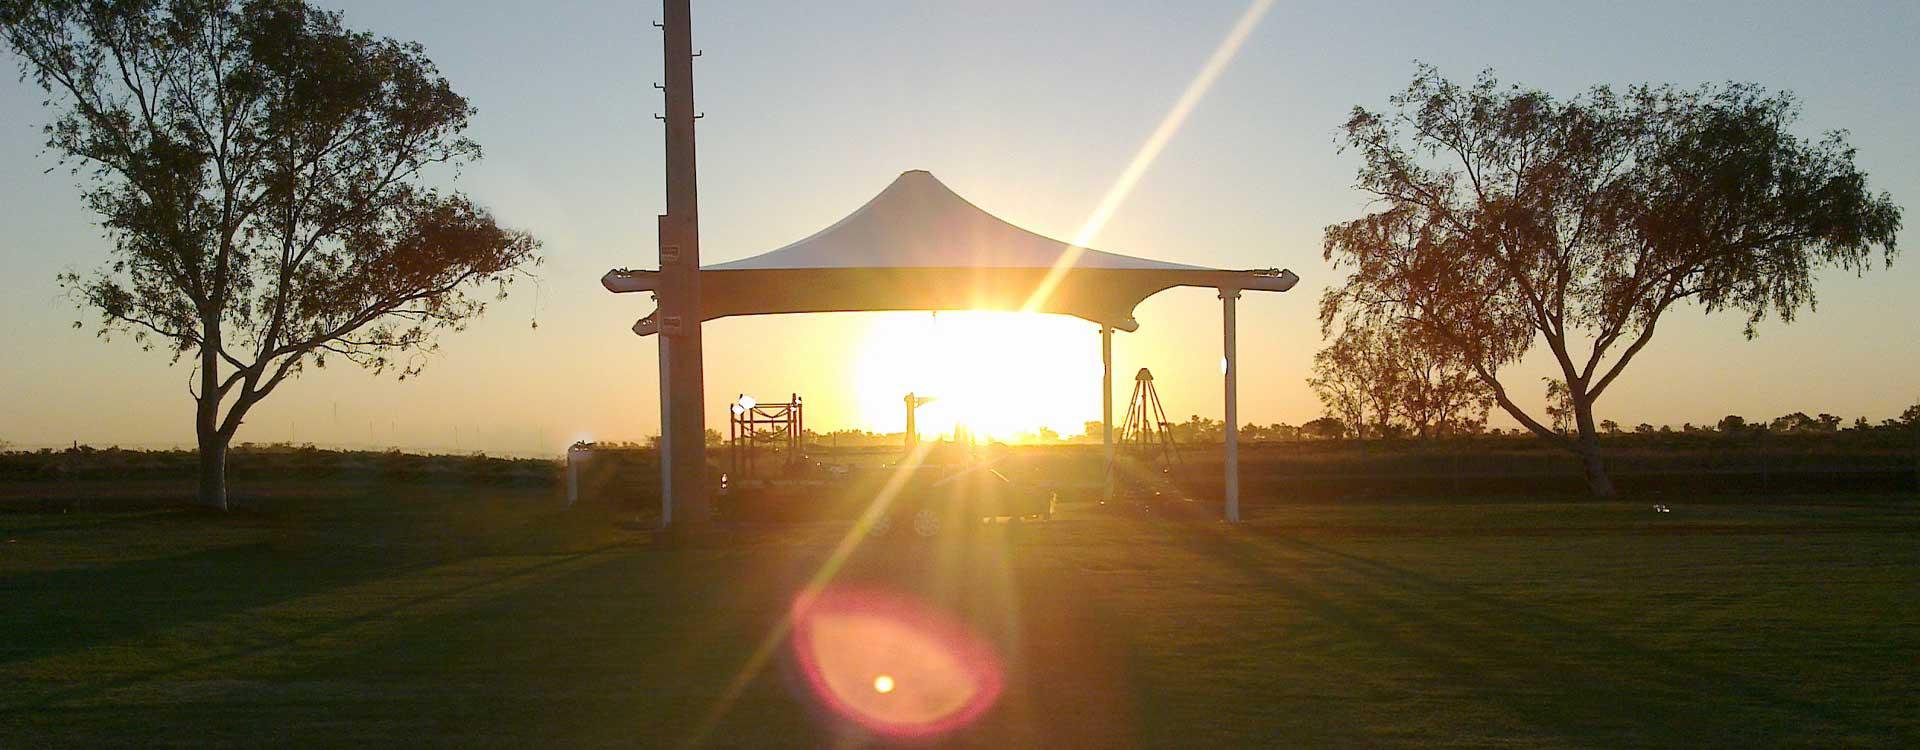 Port Hedland Playground Pavilion